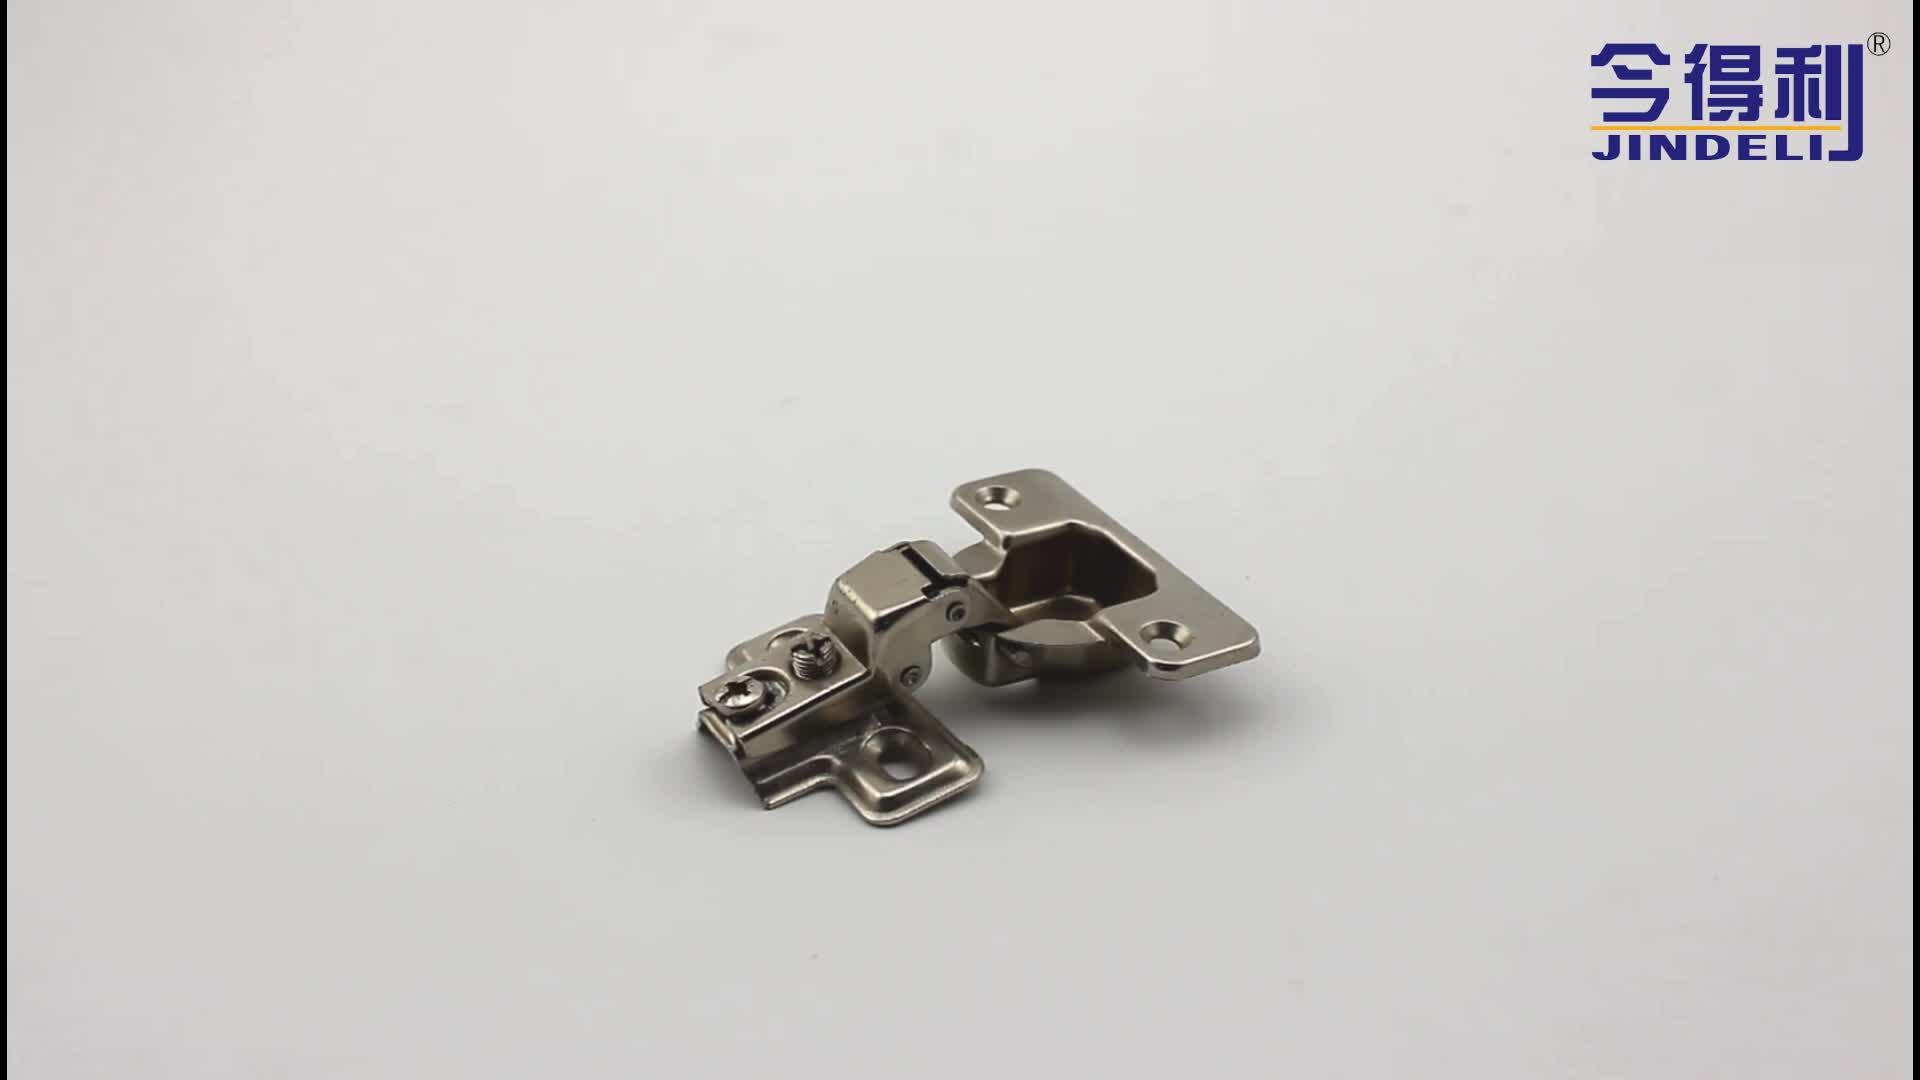 Furniture Hardware short arm self closing aluminium door hinge concealed cabinet hinge for furniture